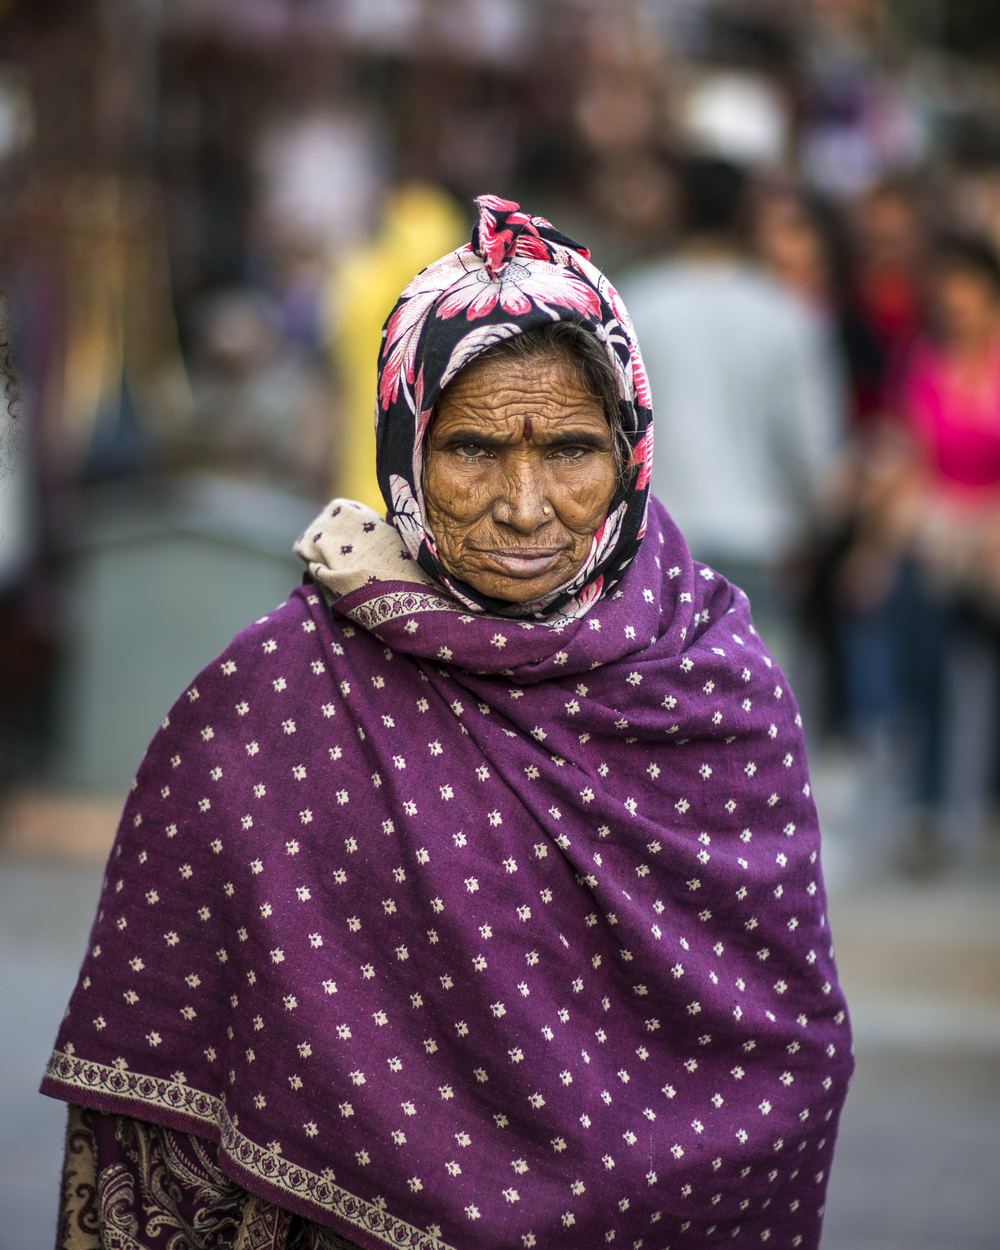 20151216 - Jaipur (Old Lady)-1.jpg